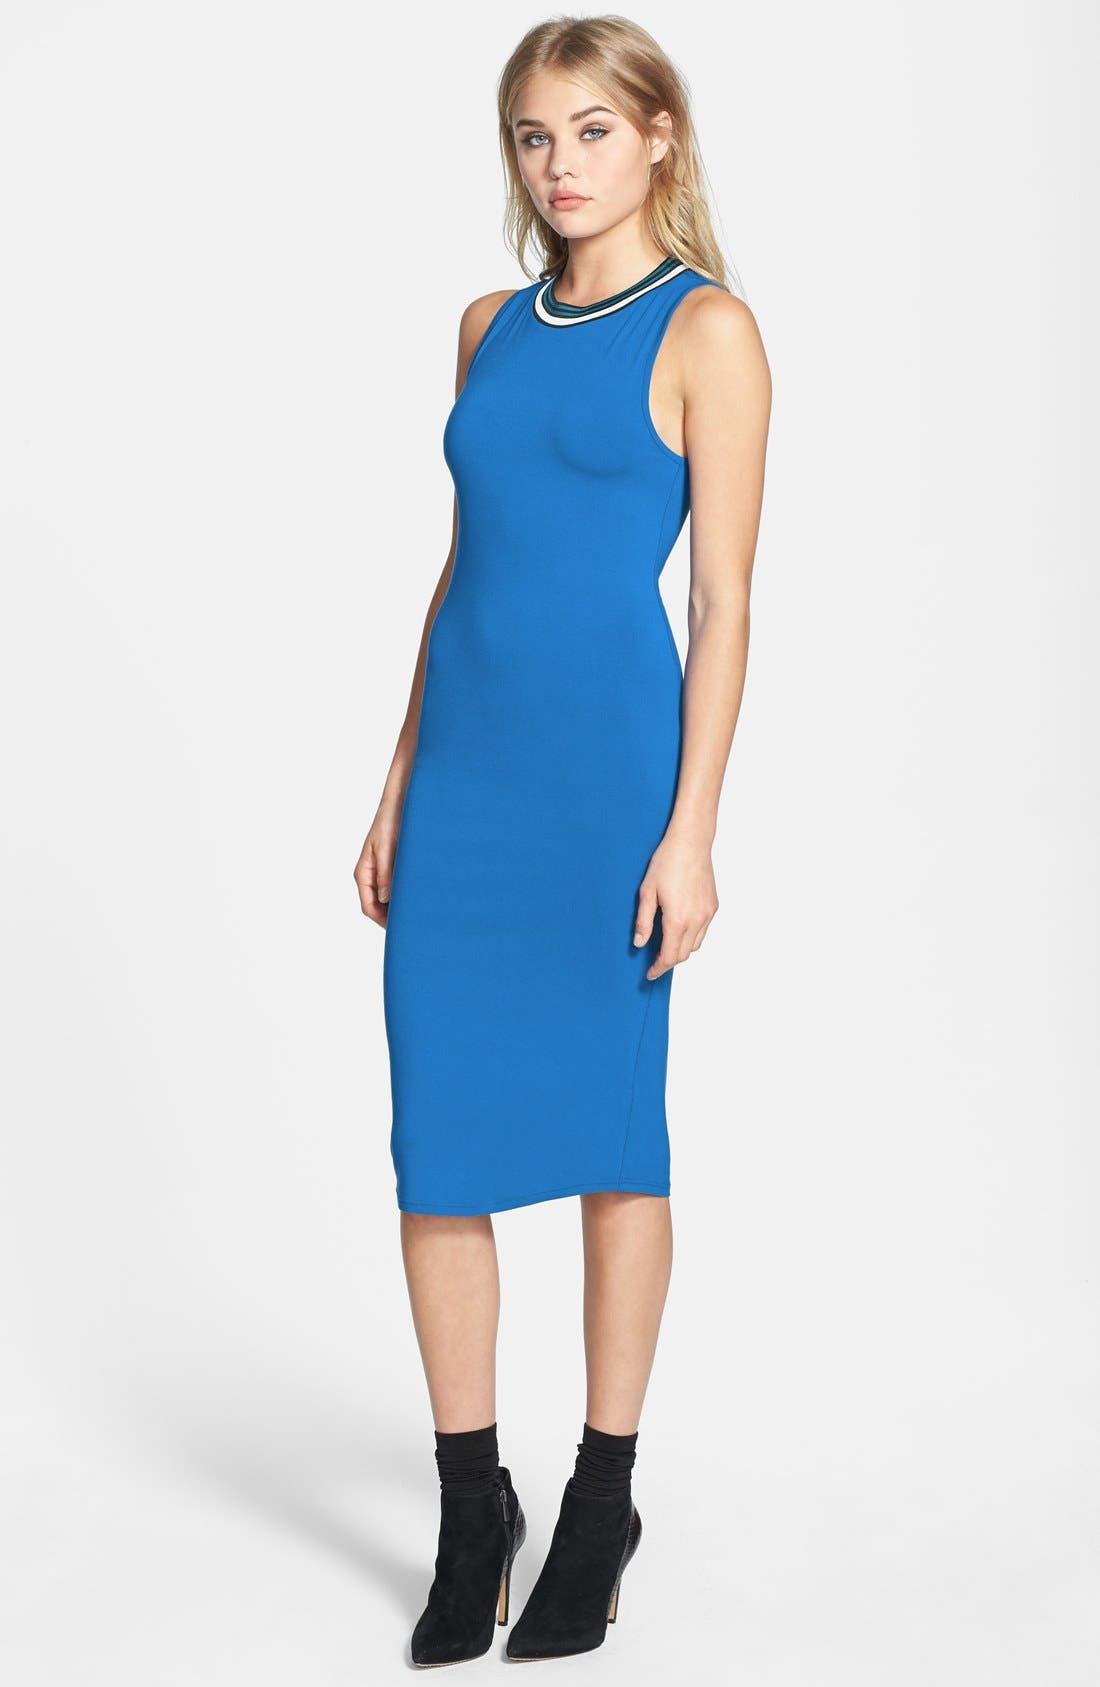 Alternate Image 1 Selected - Topshop Contrast Trim Jersey Midi Dress (Nordstrom Exclusive)